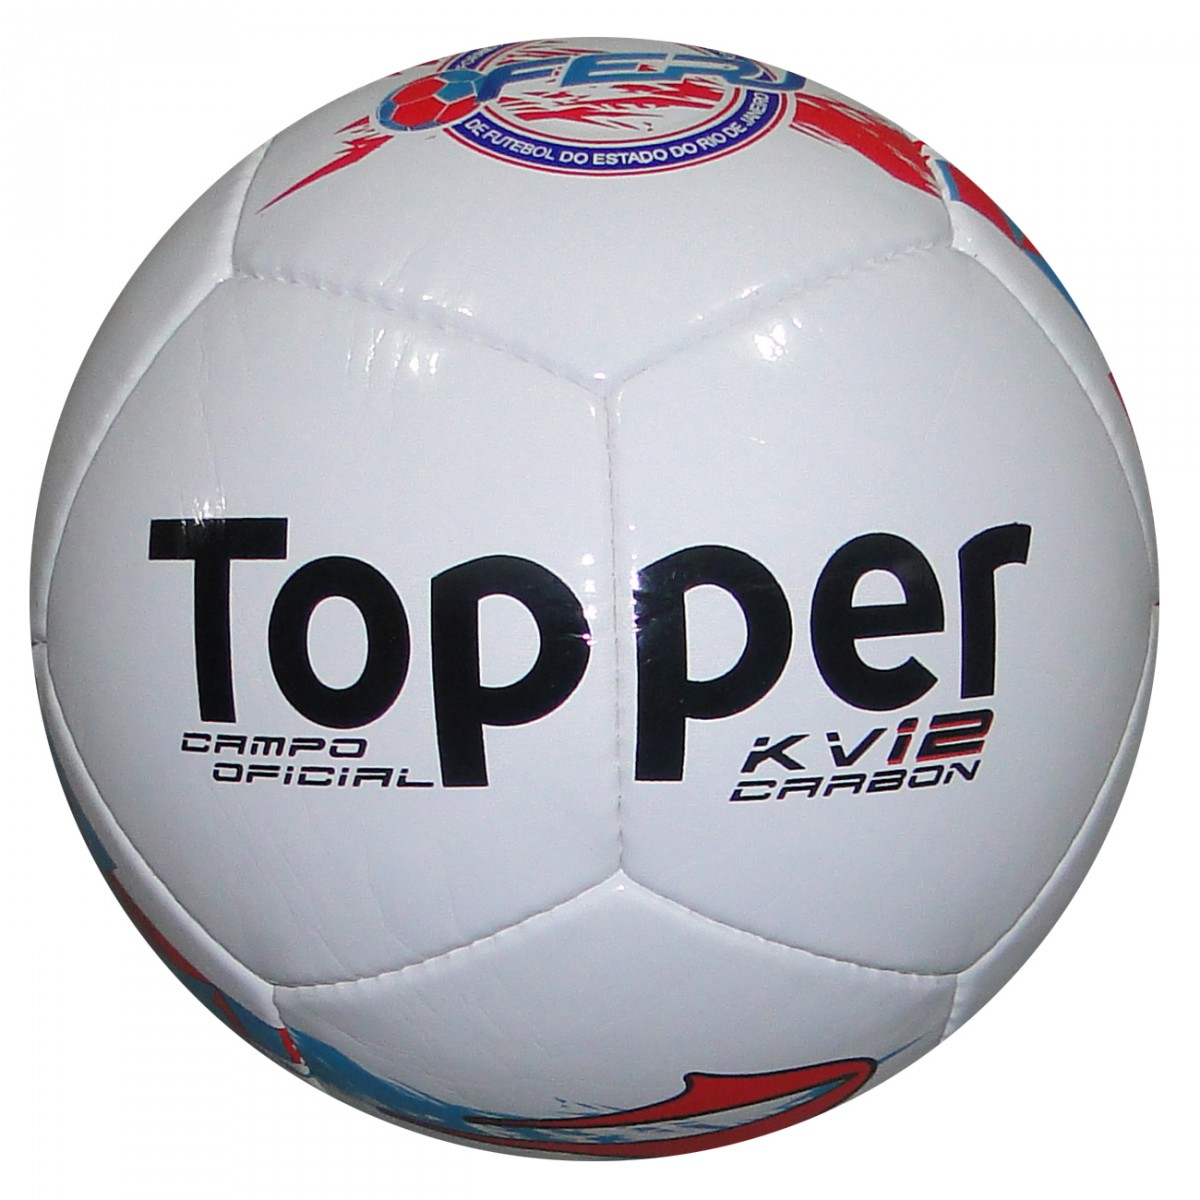 Bola Topper Kv 12 Carbon 4129032-0341-998 - Branco Azul Vermelho - Chuteira  Nike 375576423268b